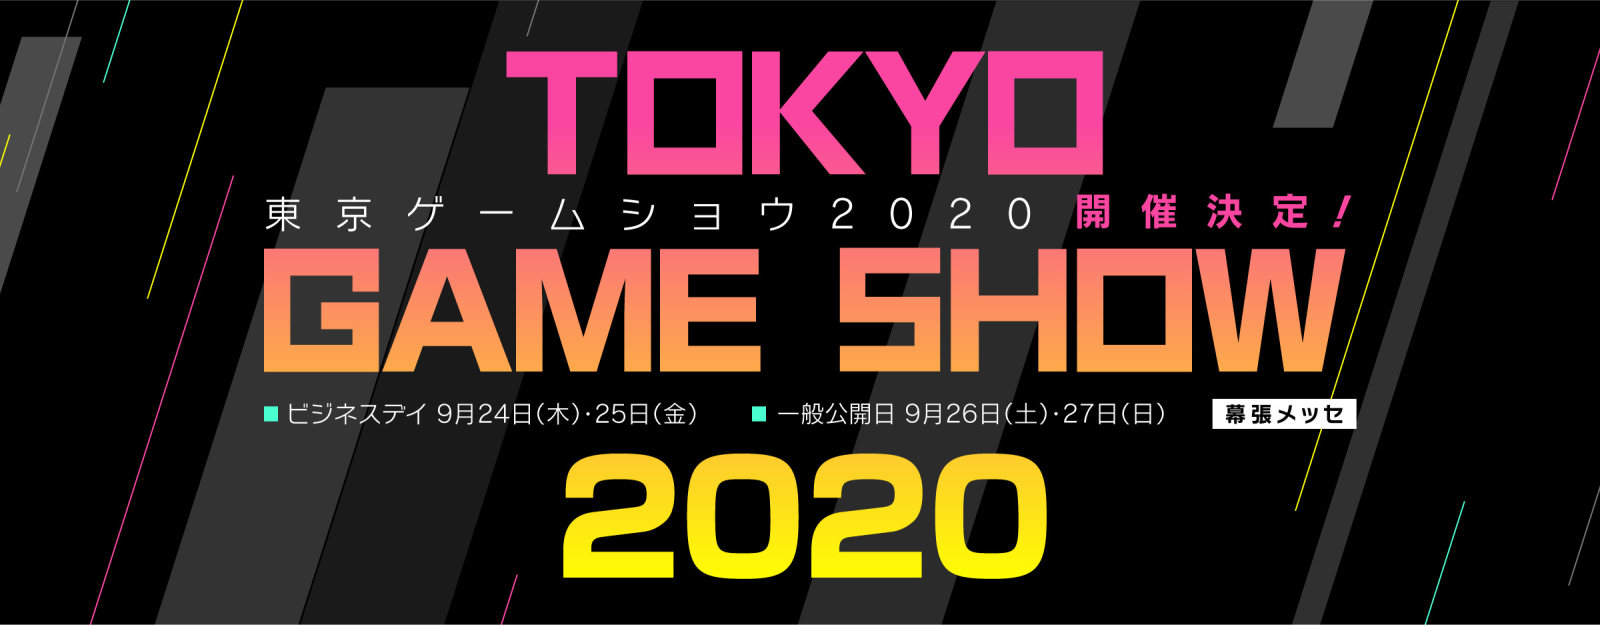 TGS 2020 官网上线,PS5、Xbox Series X共同参展